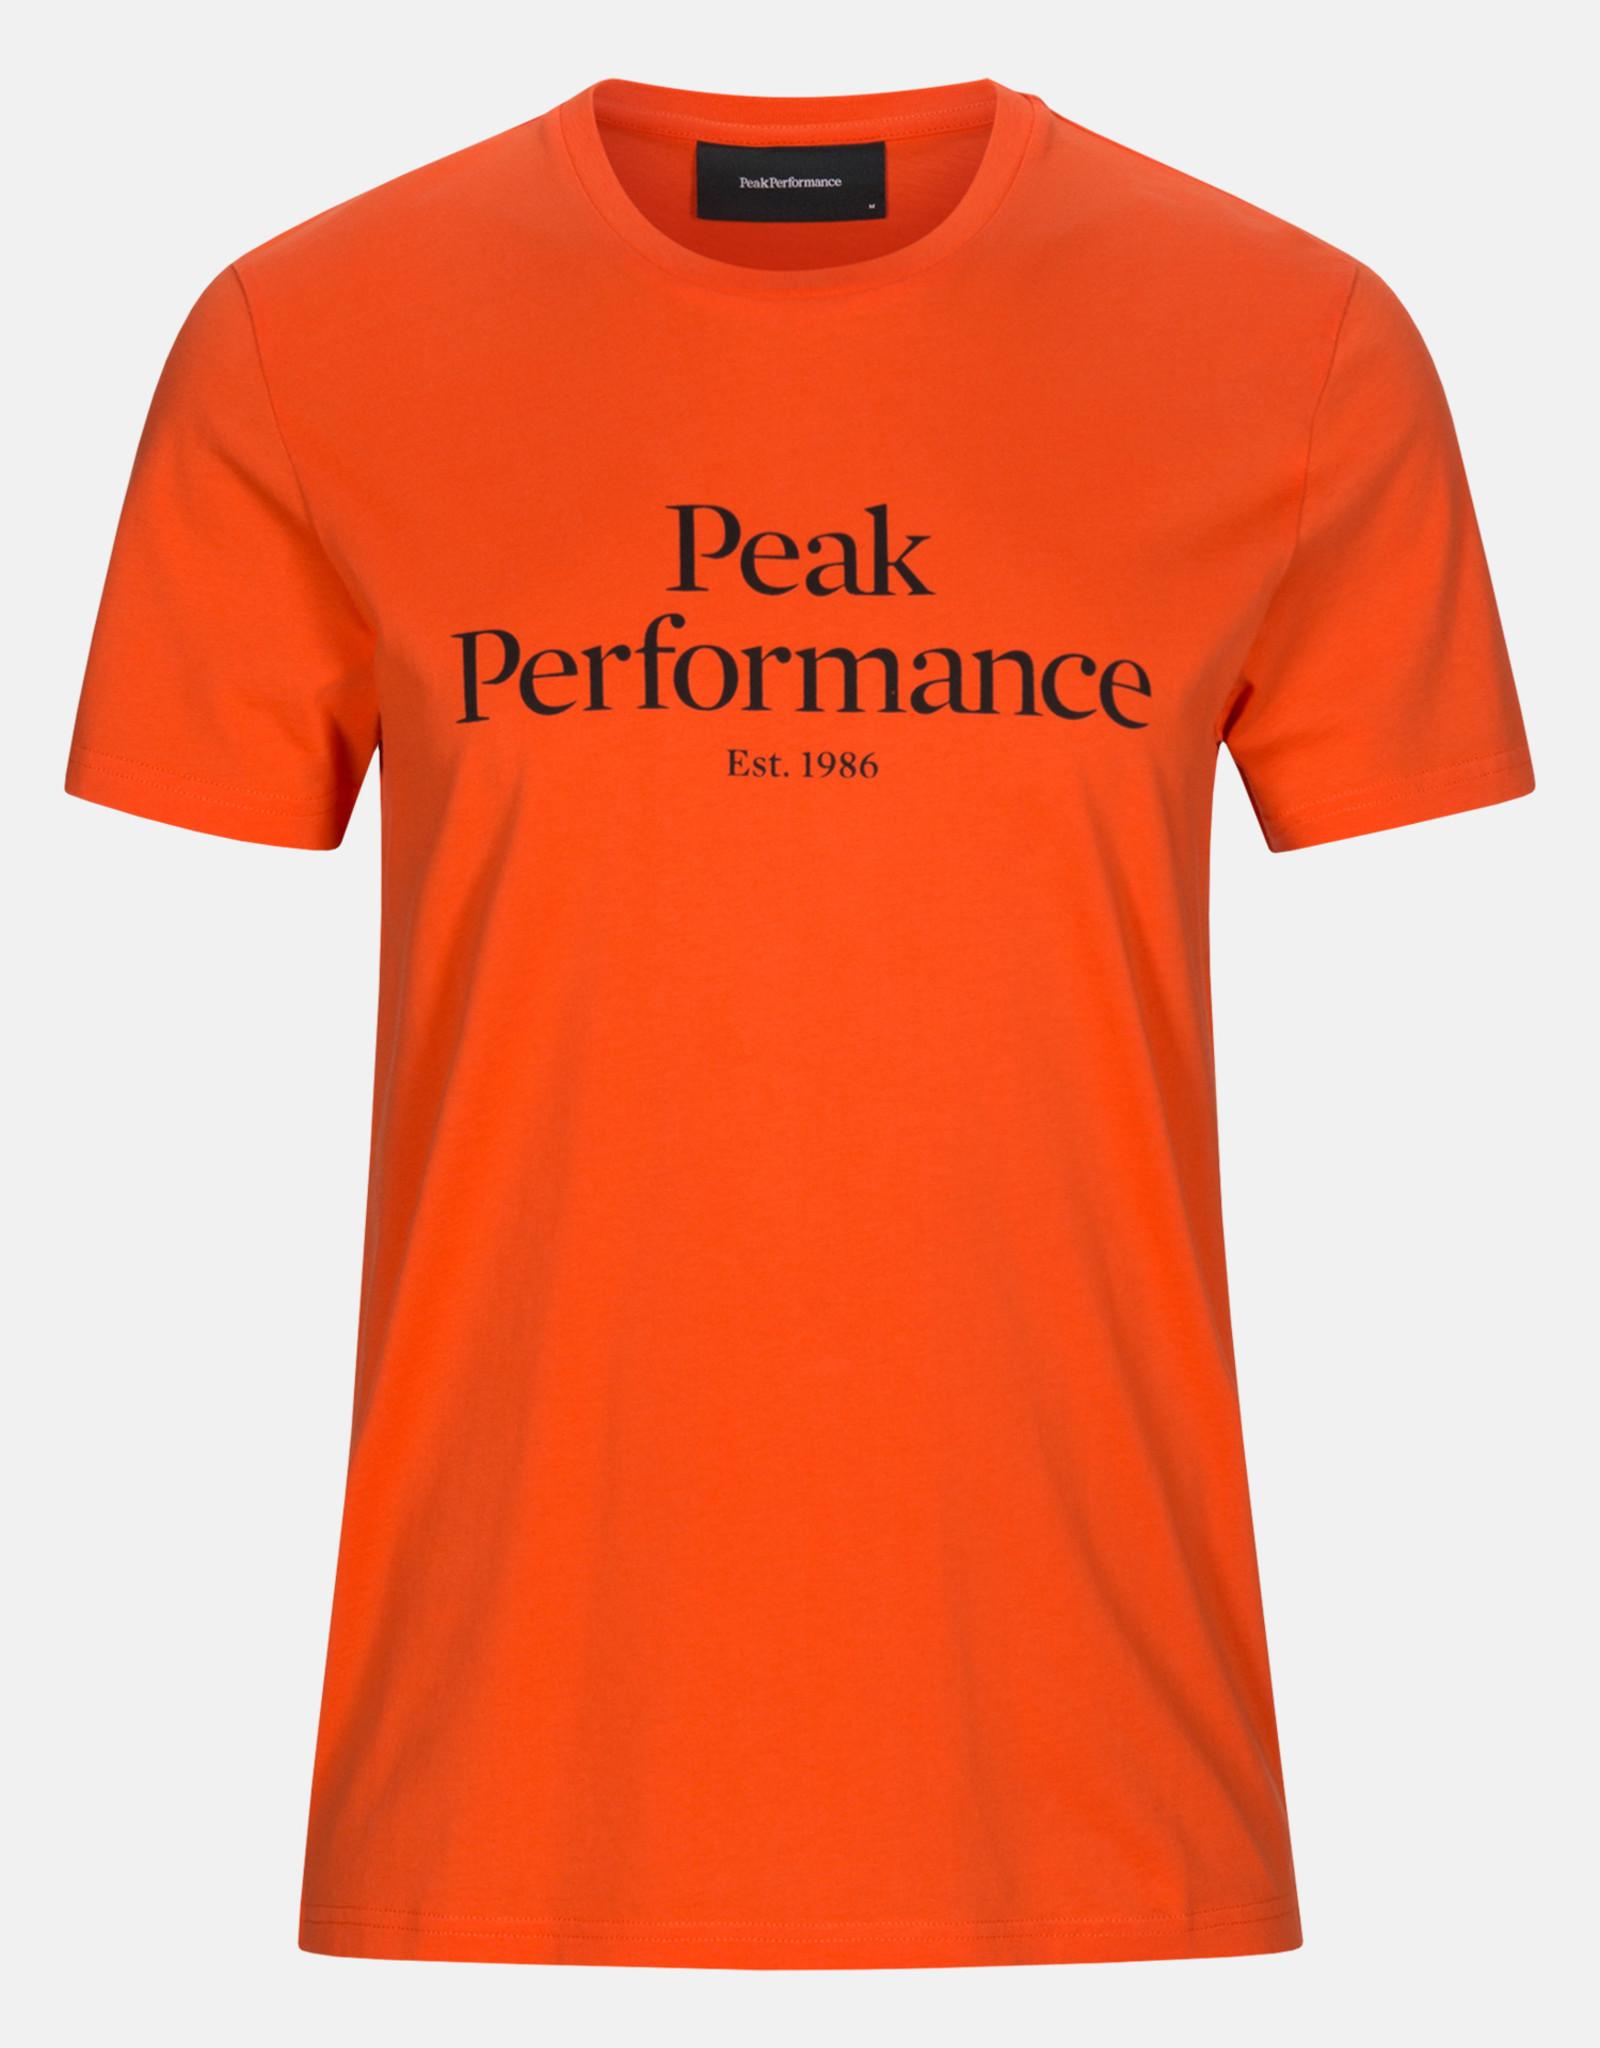 Peak Performance Peak Performance Men's Original Tee - S2020